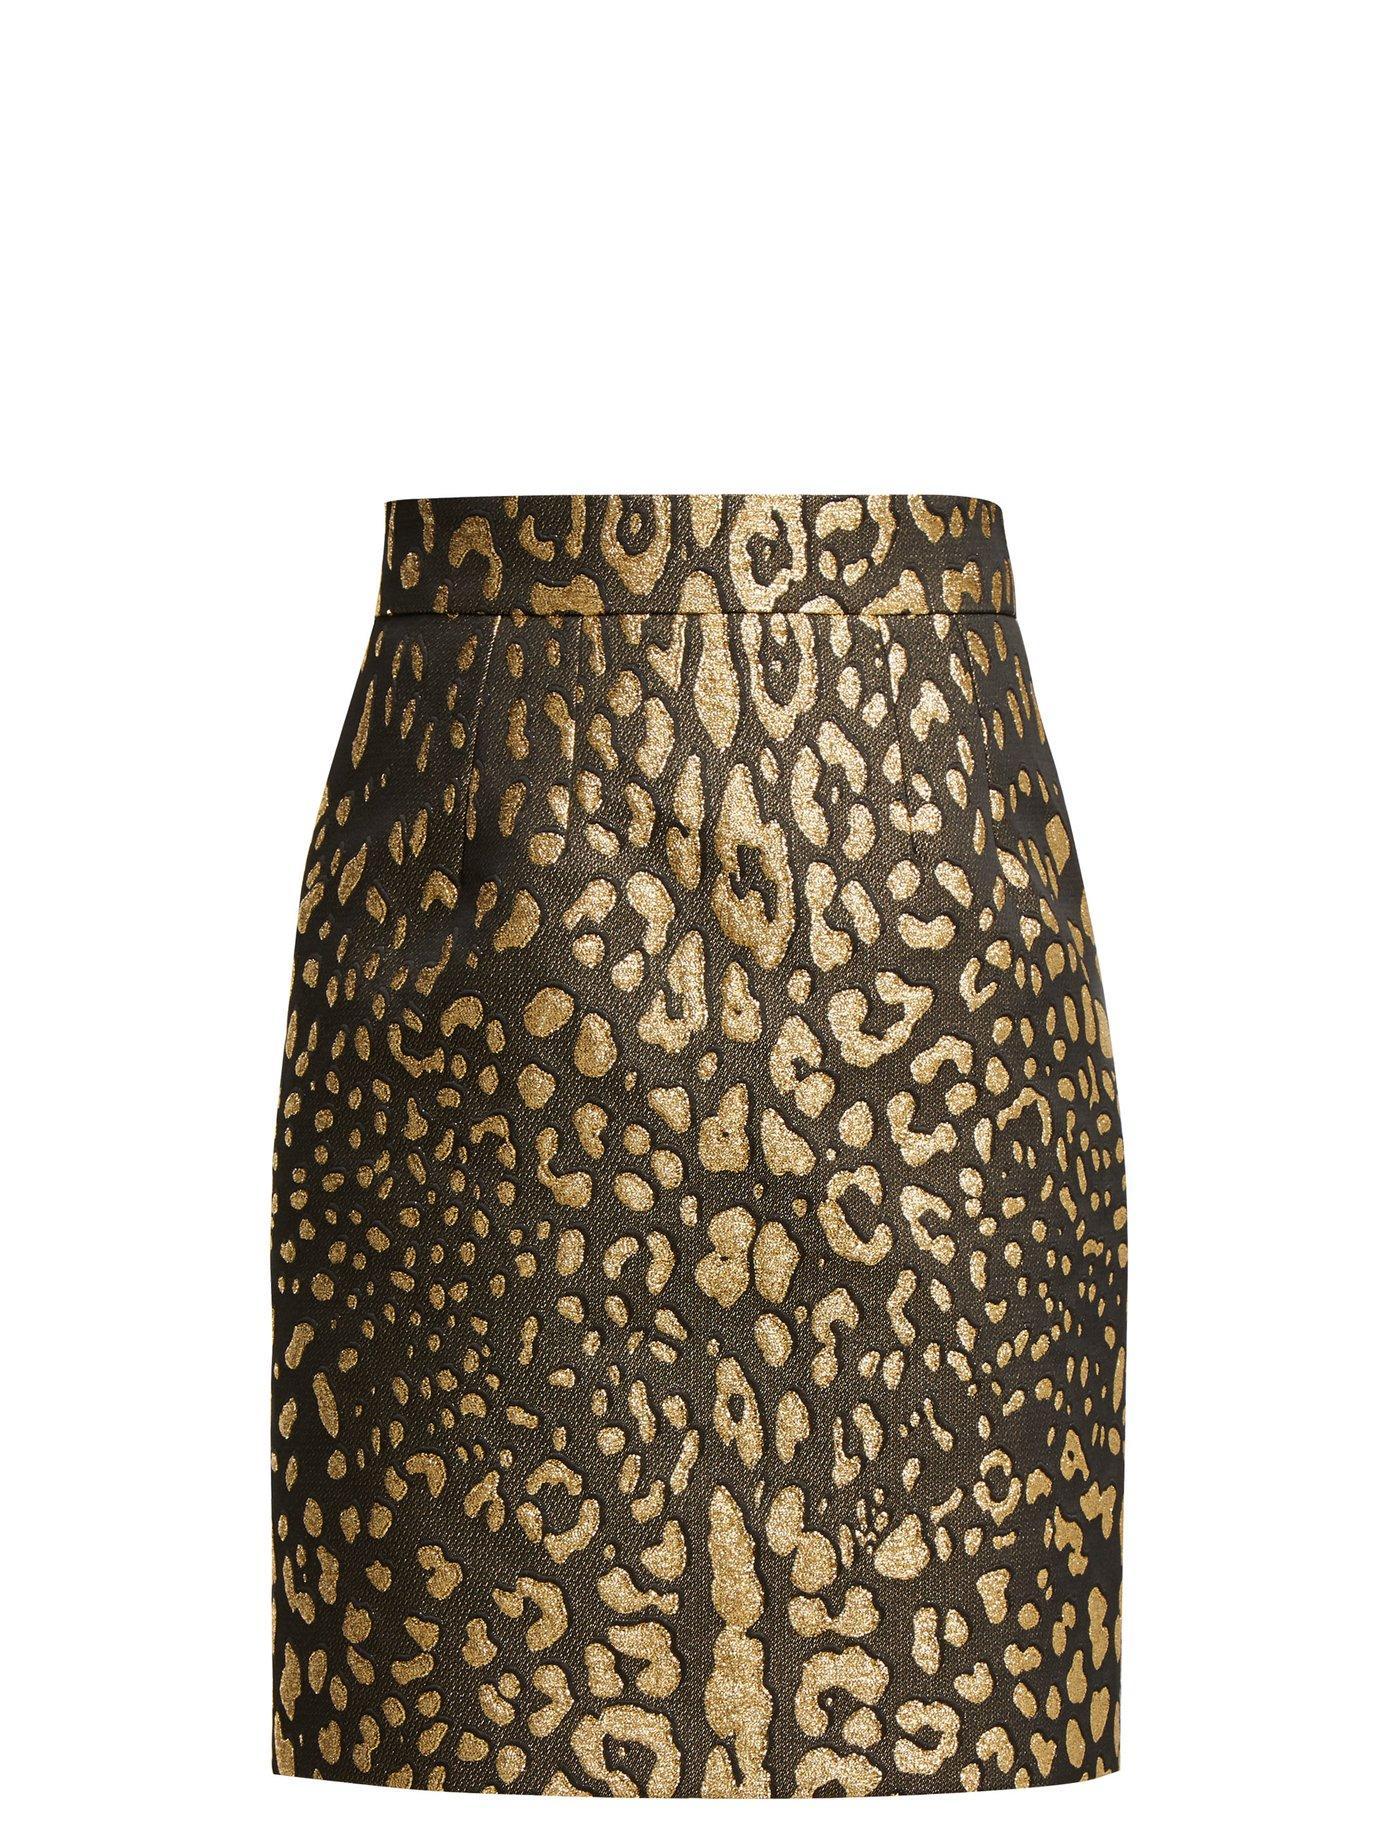 464a920cc63959 Dolce & Gabbana. Women's Black Leopard Print High Rise Jacquard Mini Skirt